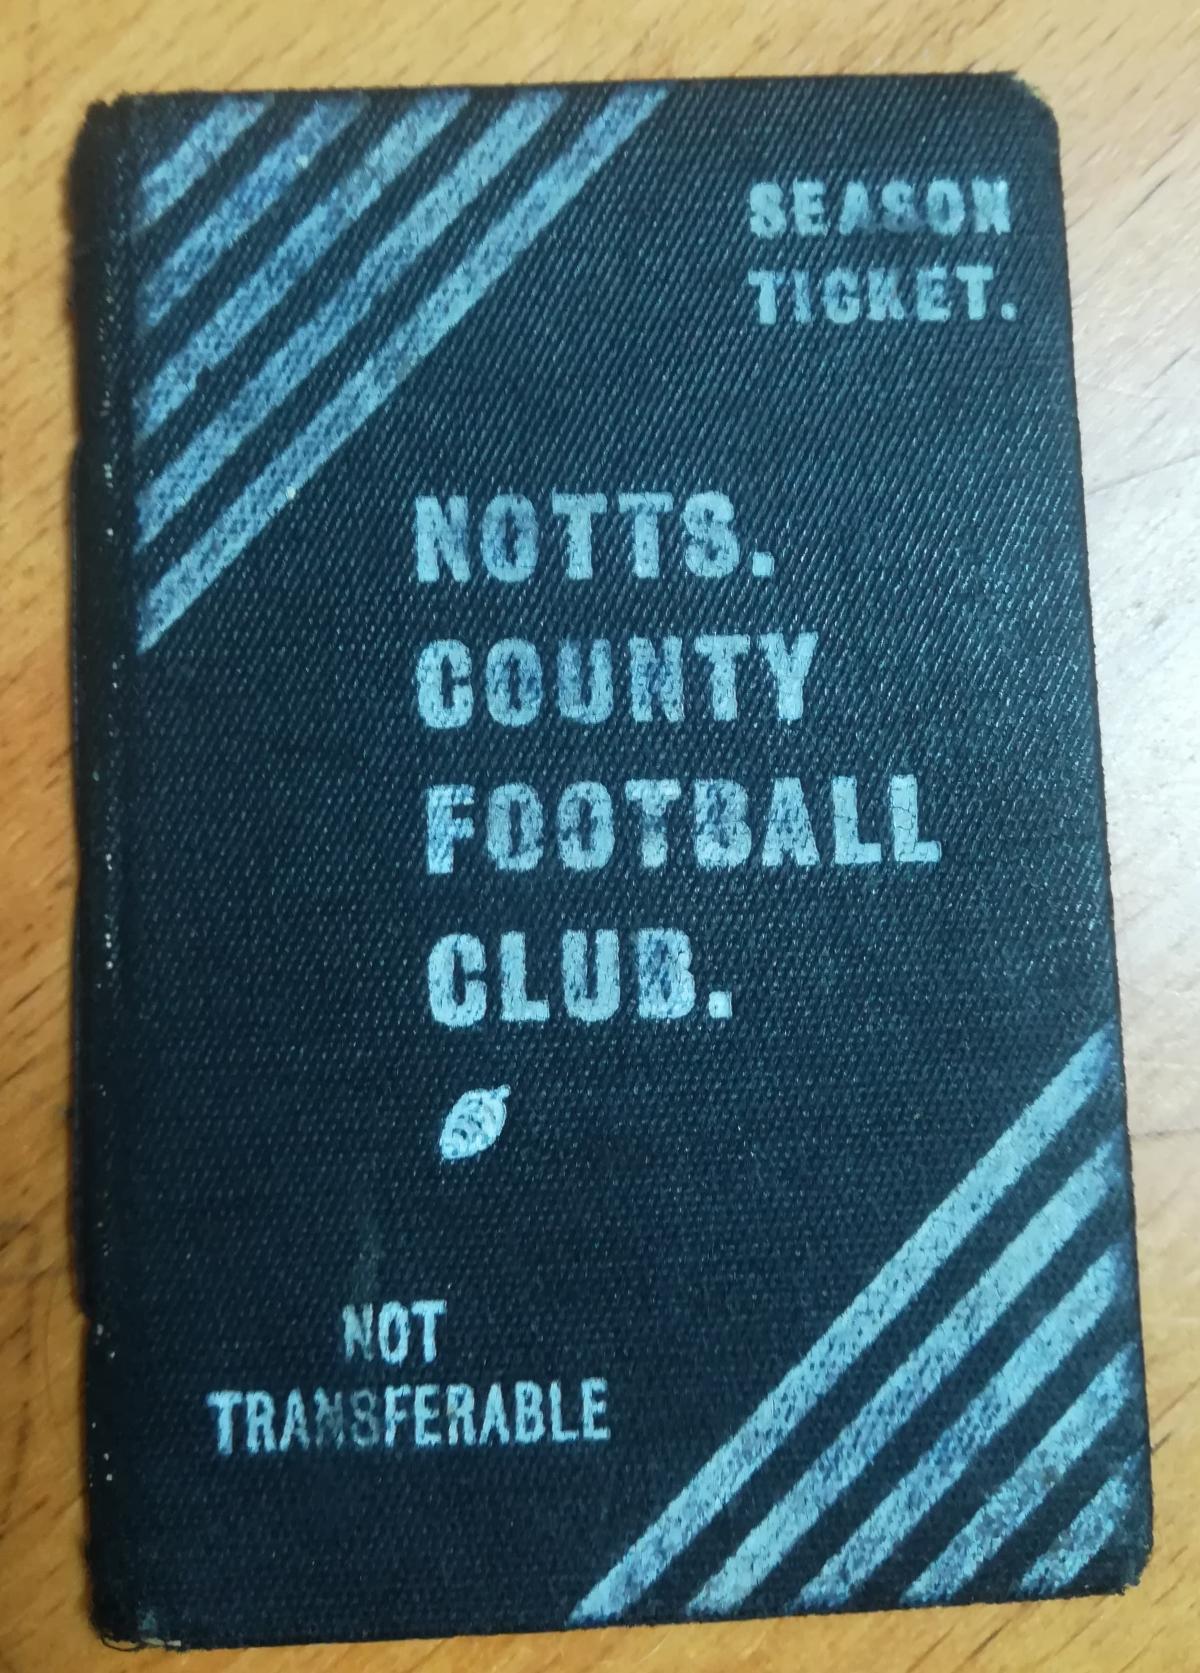 old Football season ticket collector